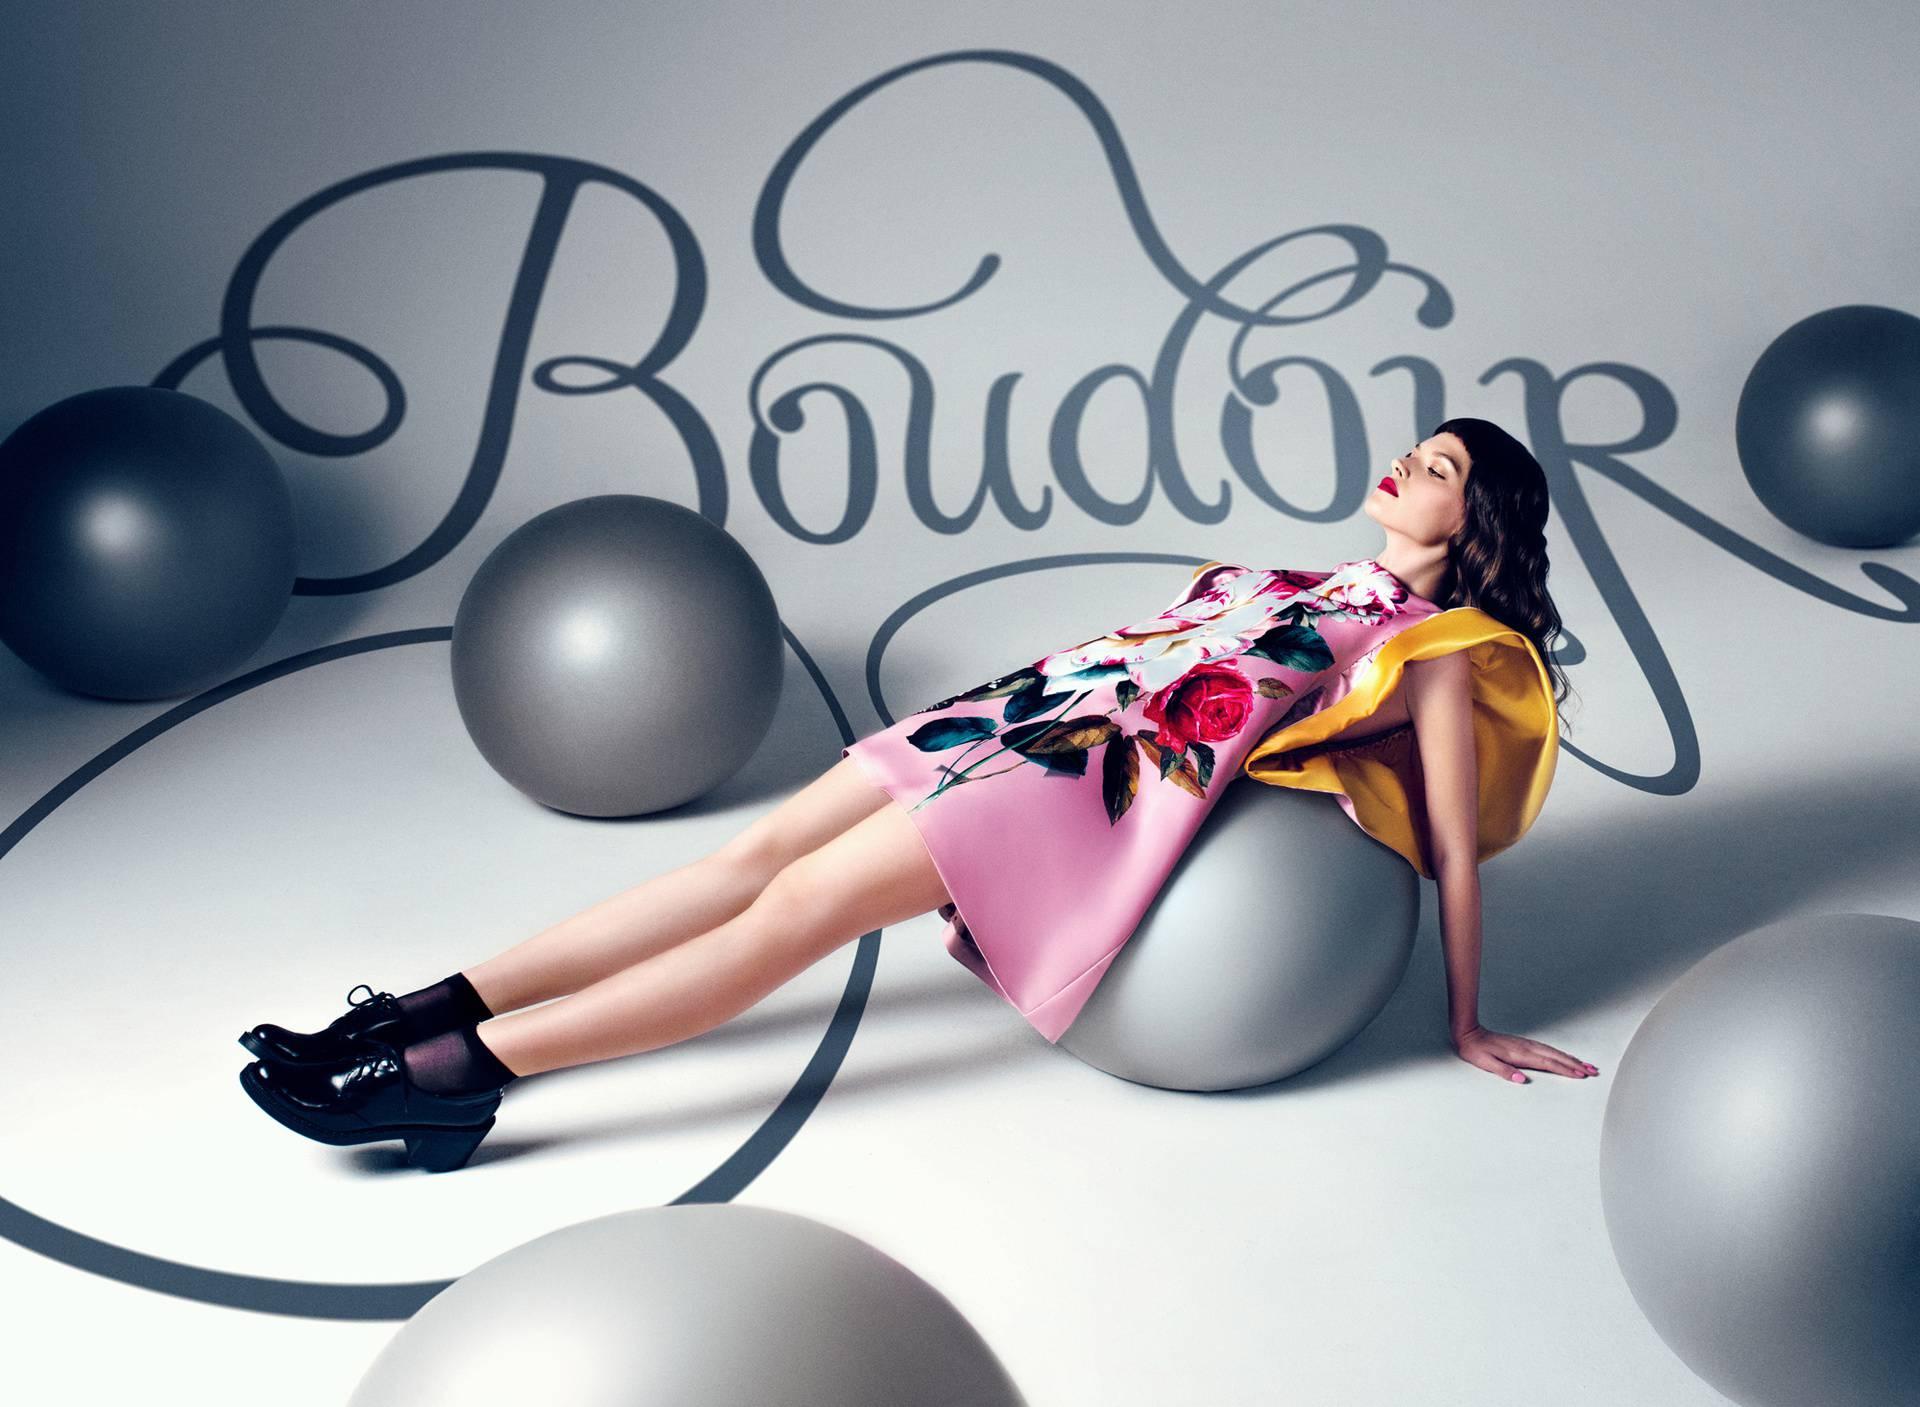 Atelje Boudoir: Stilska obrada raskošne Alise u zemlji čudesa